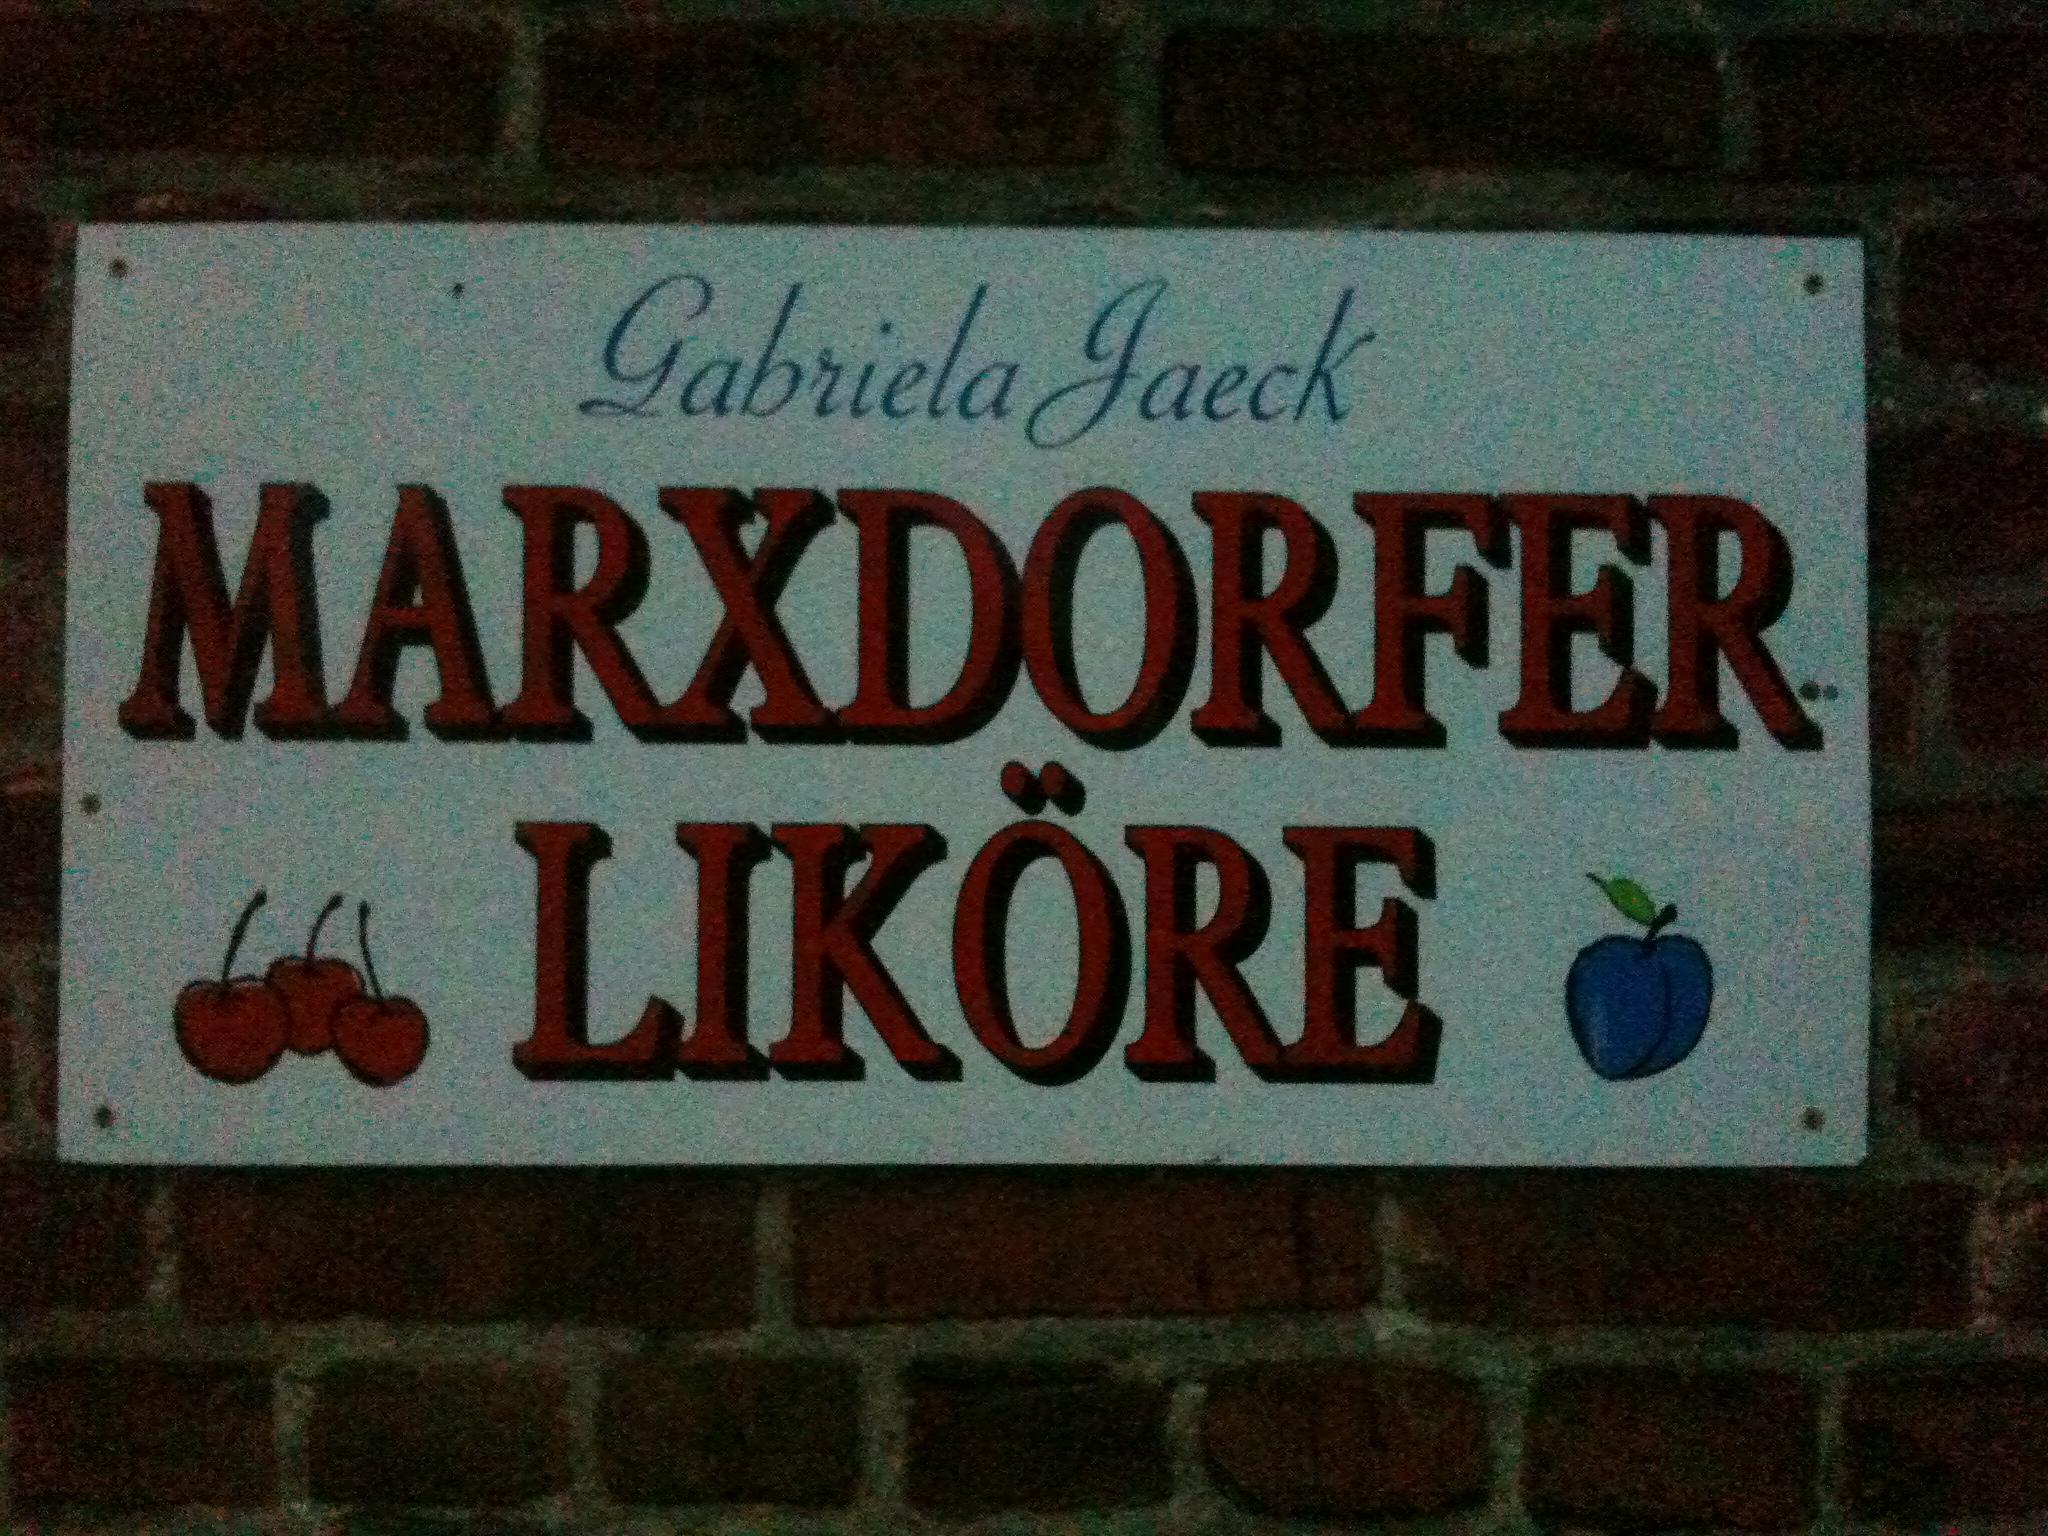 Marxdorf-Maxdorfer-Likoere